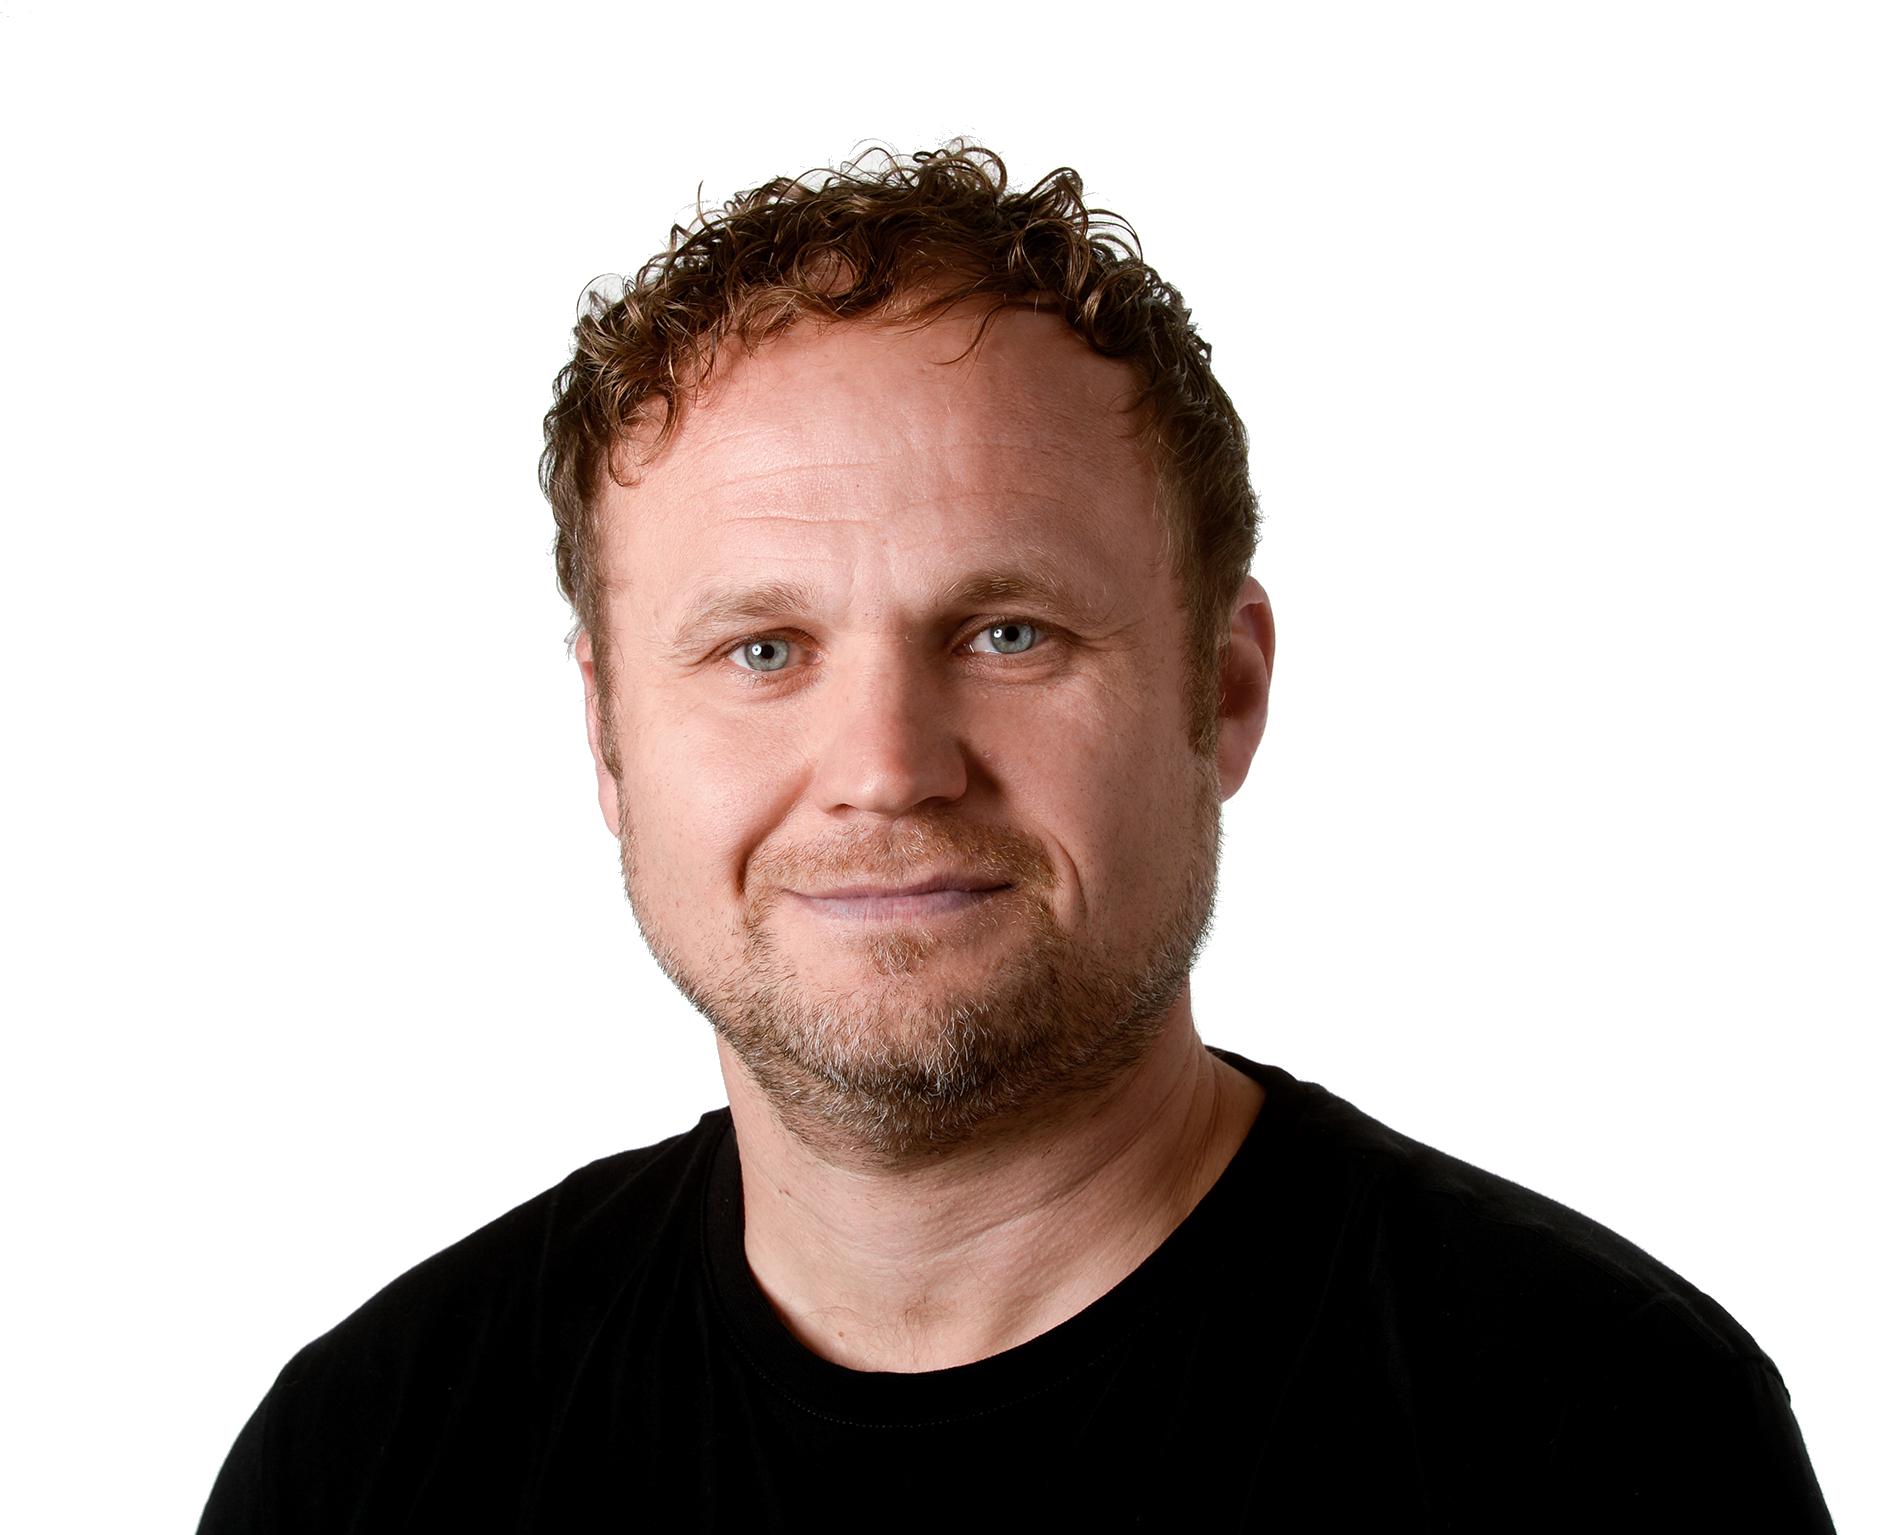 Tommas Torgersen Skretting